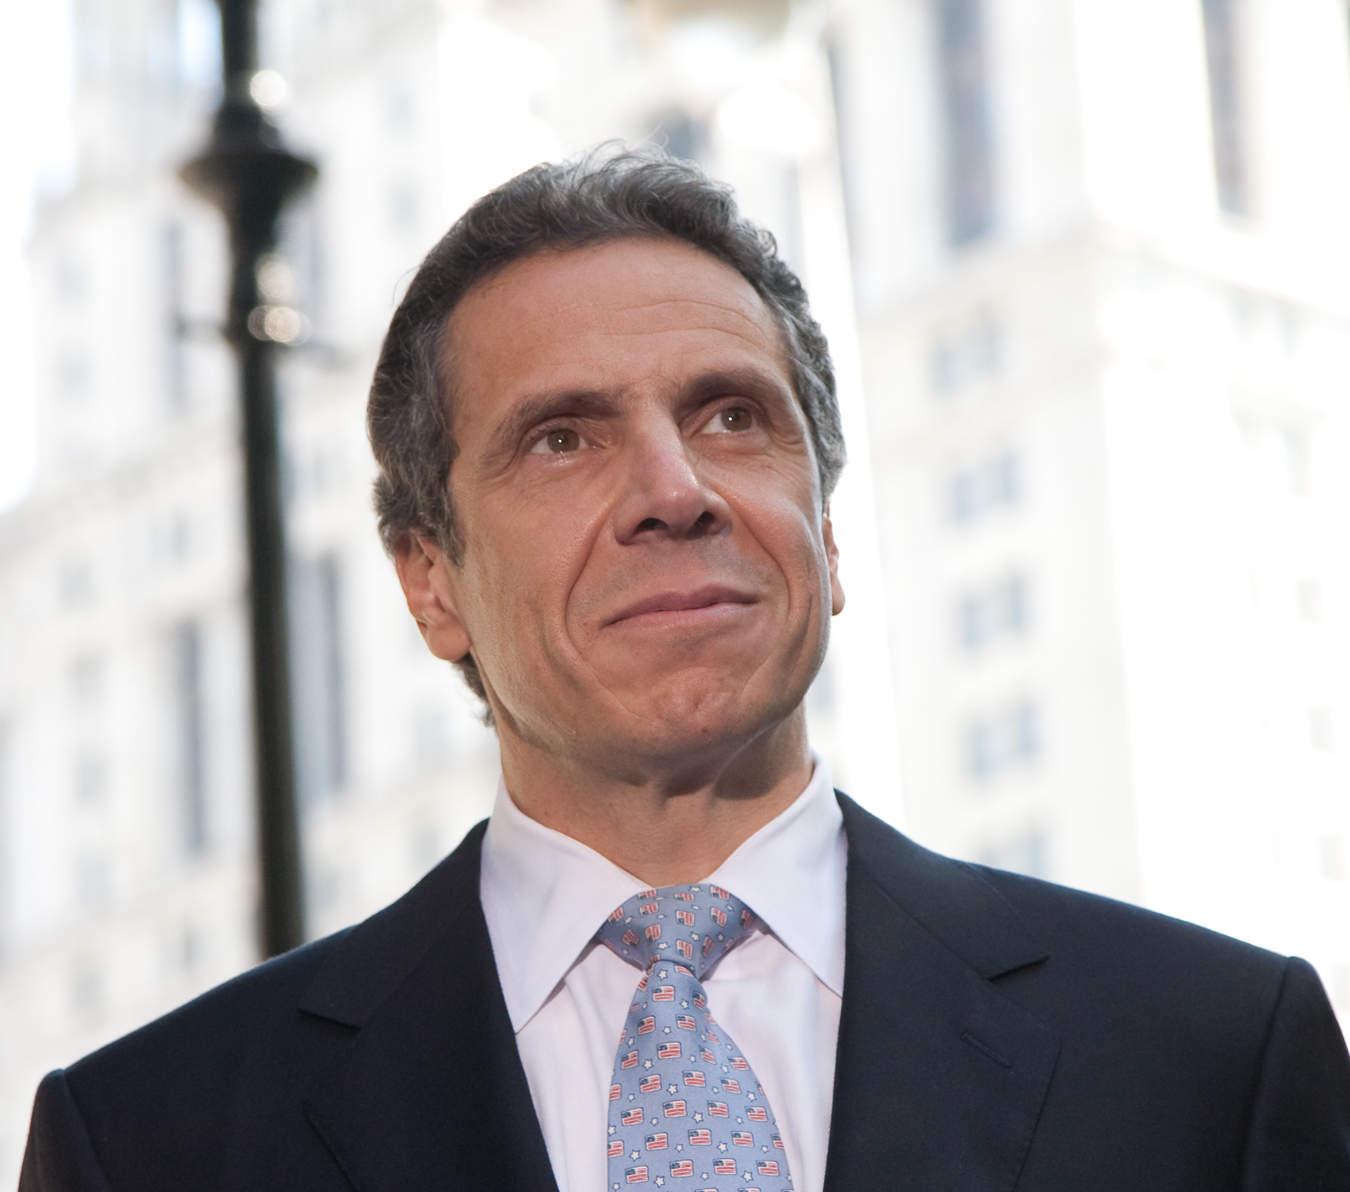 new york's clean energy